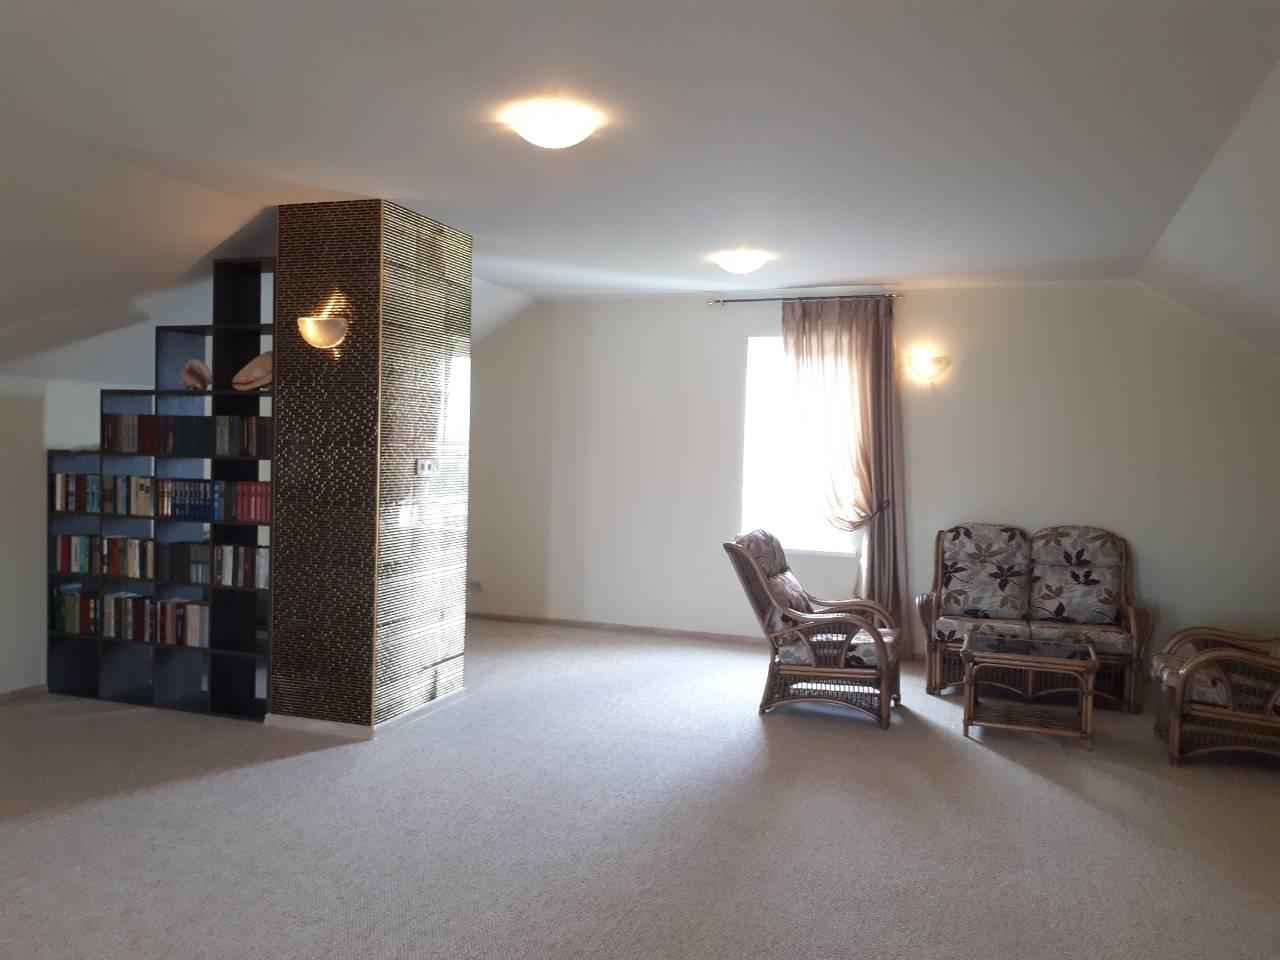 продажа дома номер H-86647 в Совиньоне 3, фото номер 19